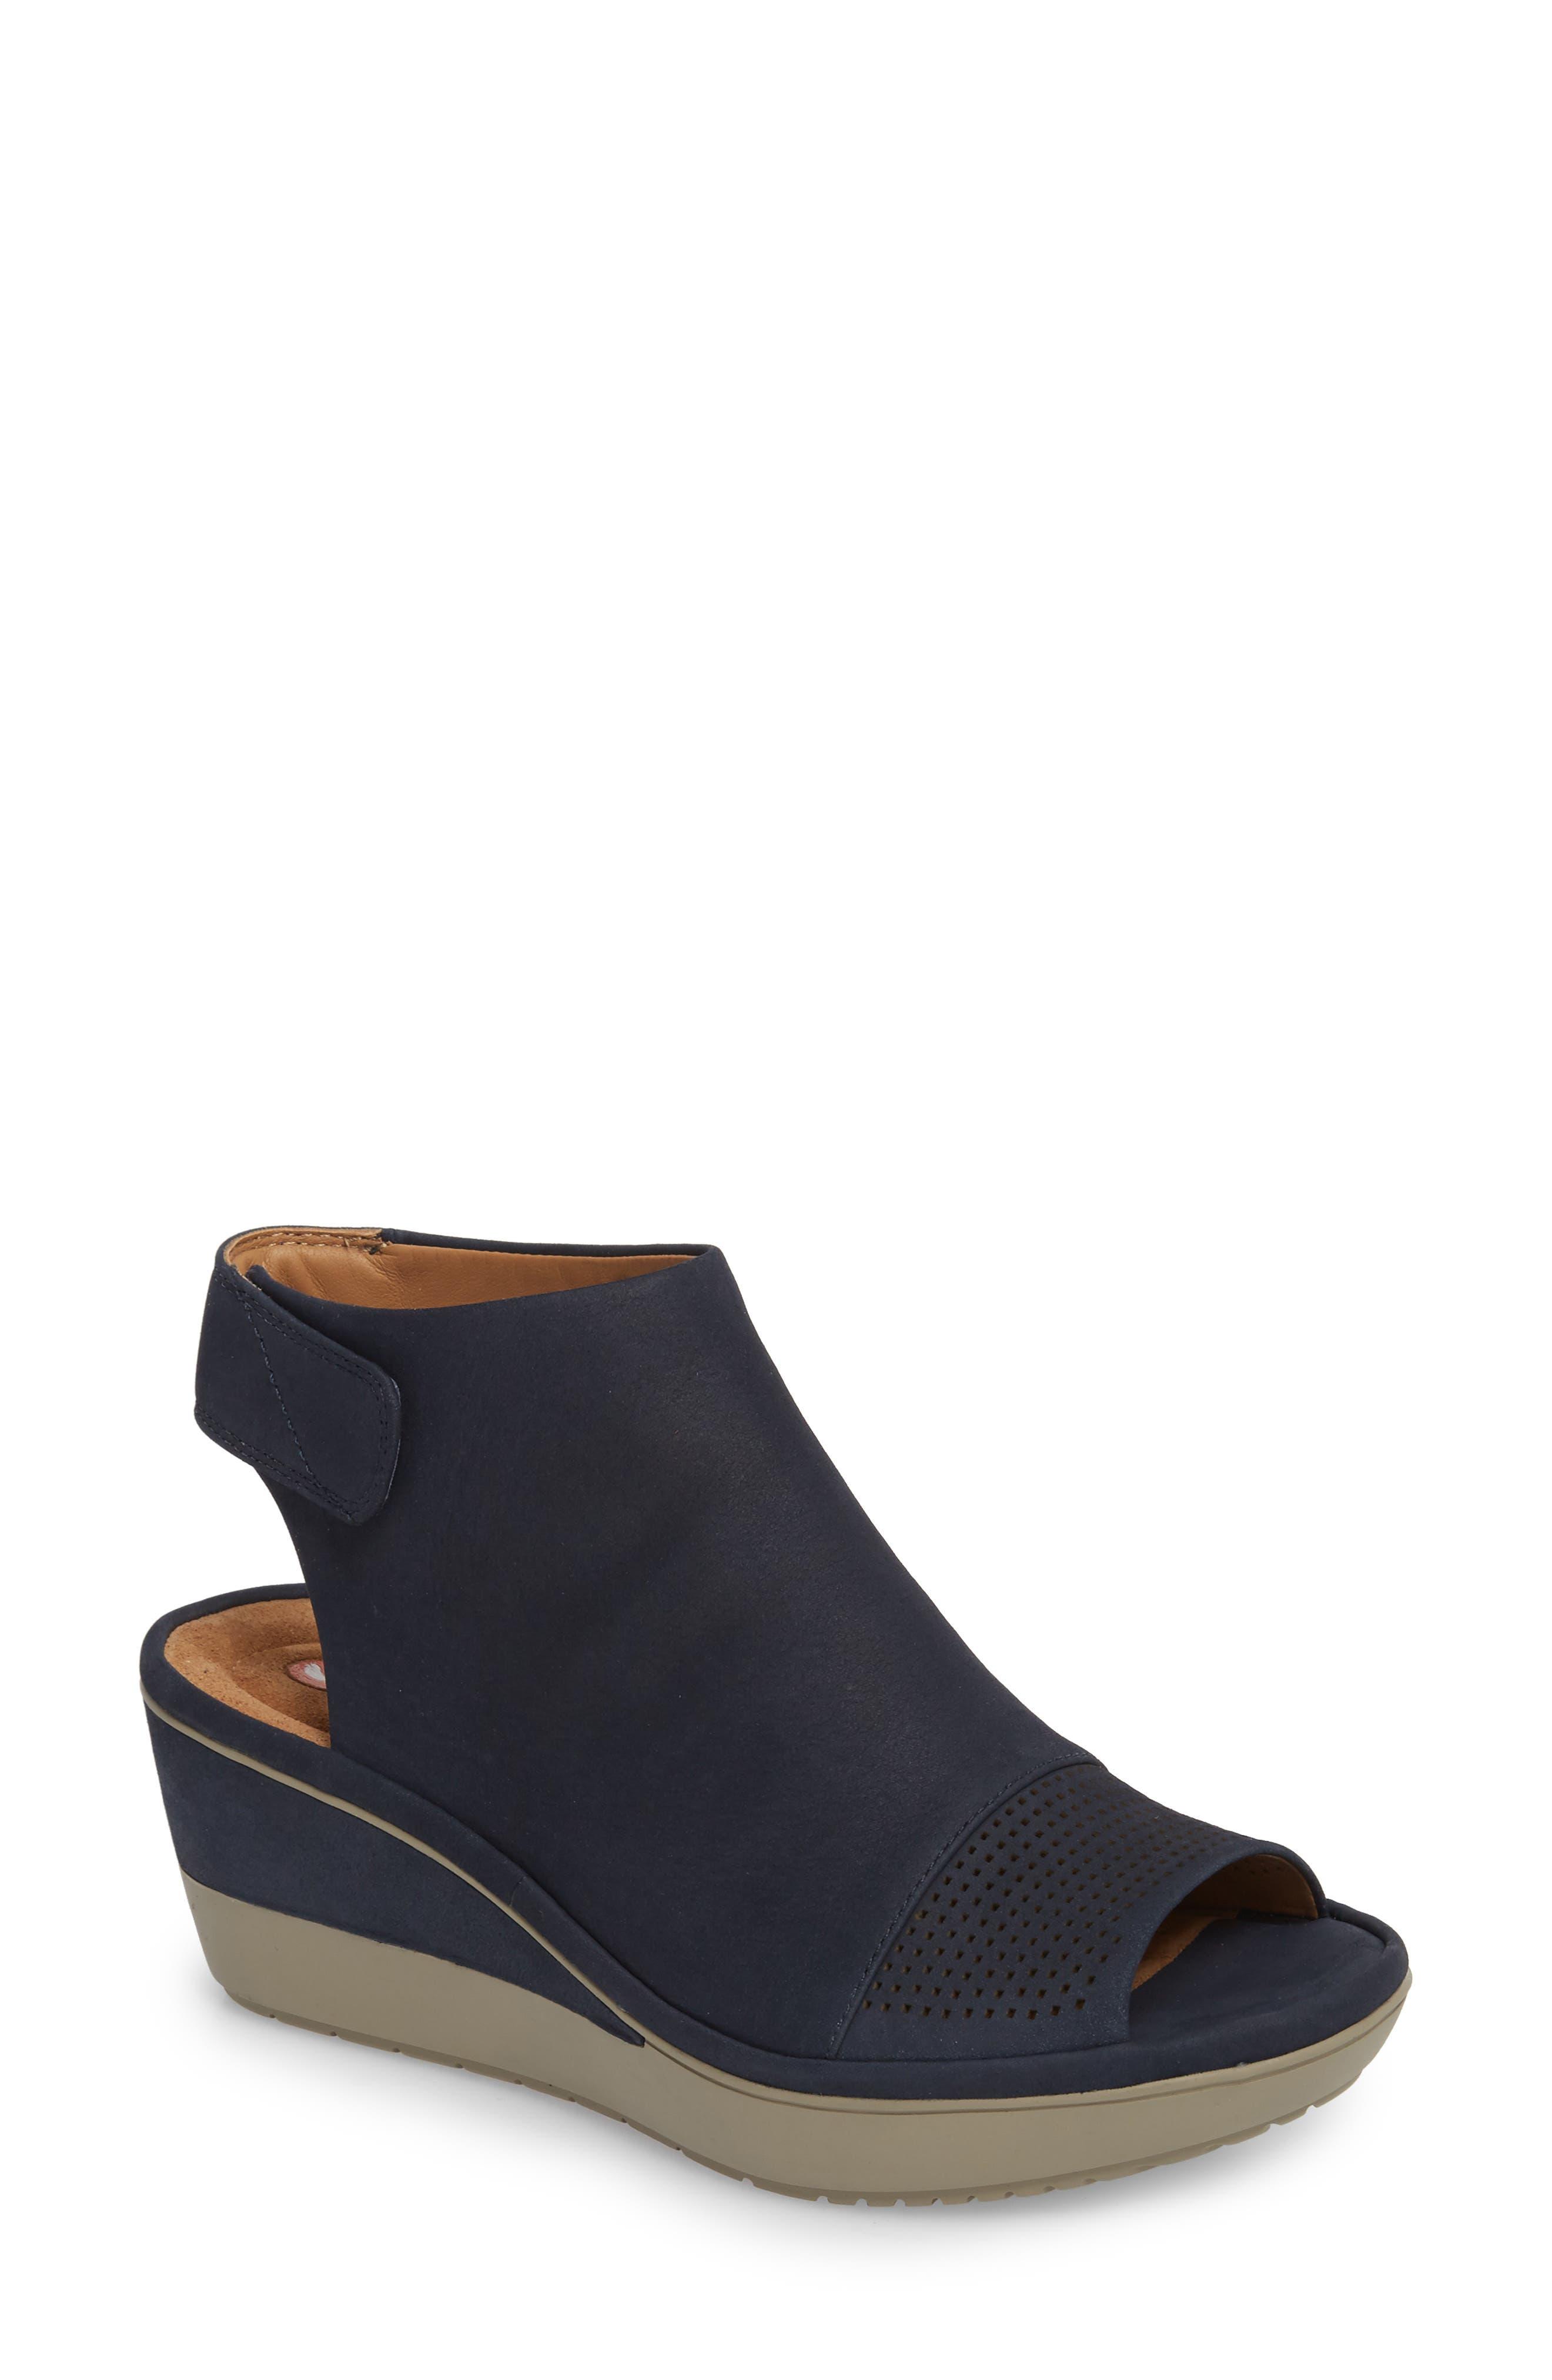 Main Image - Clarks® Wynnmere Abie Wedge Sandal (Women)